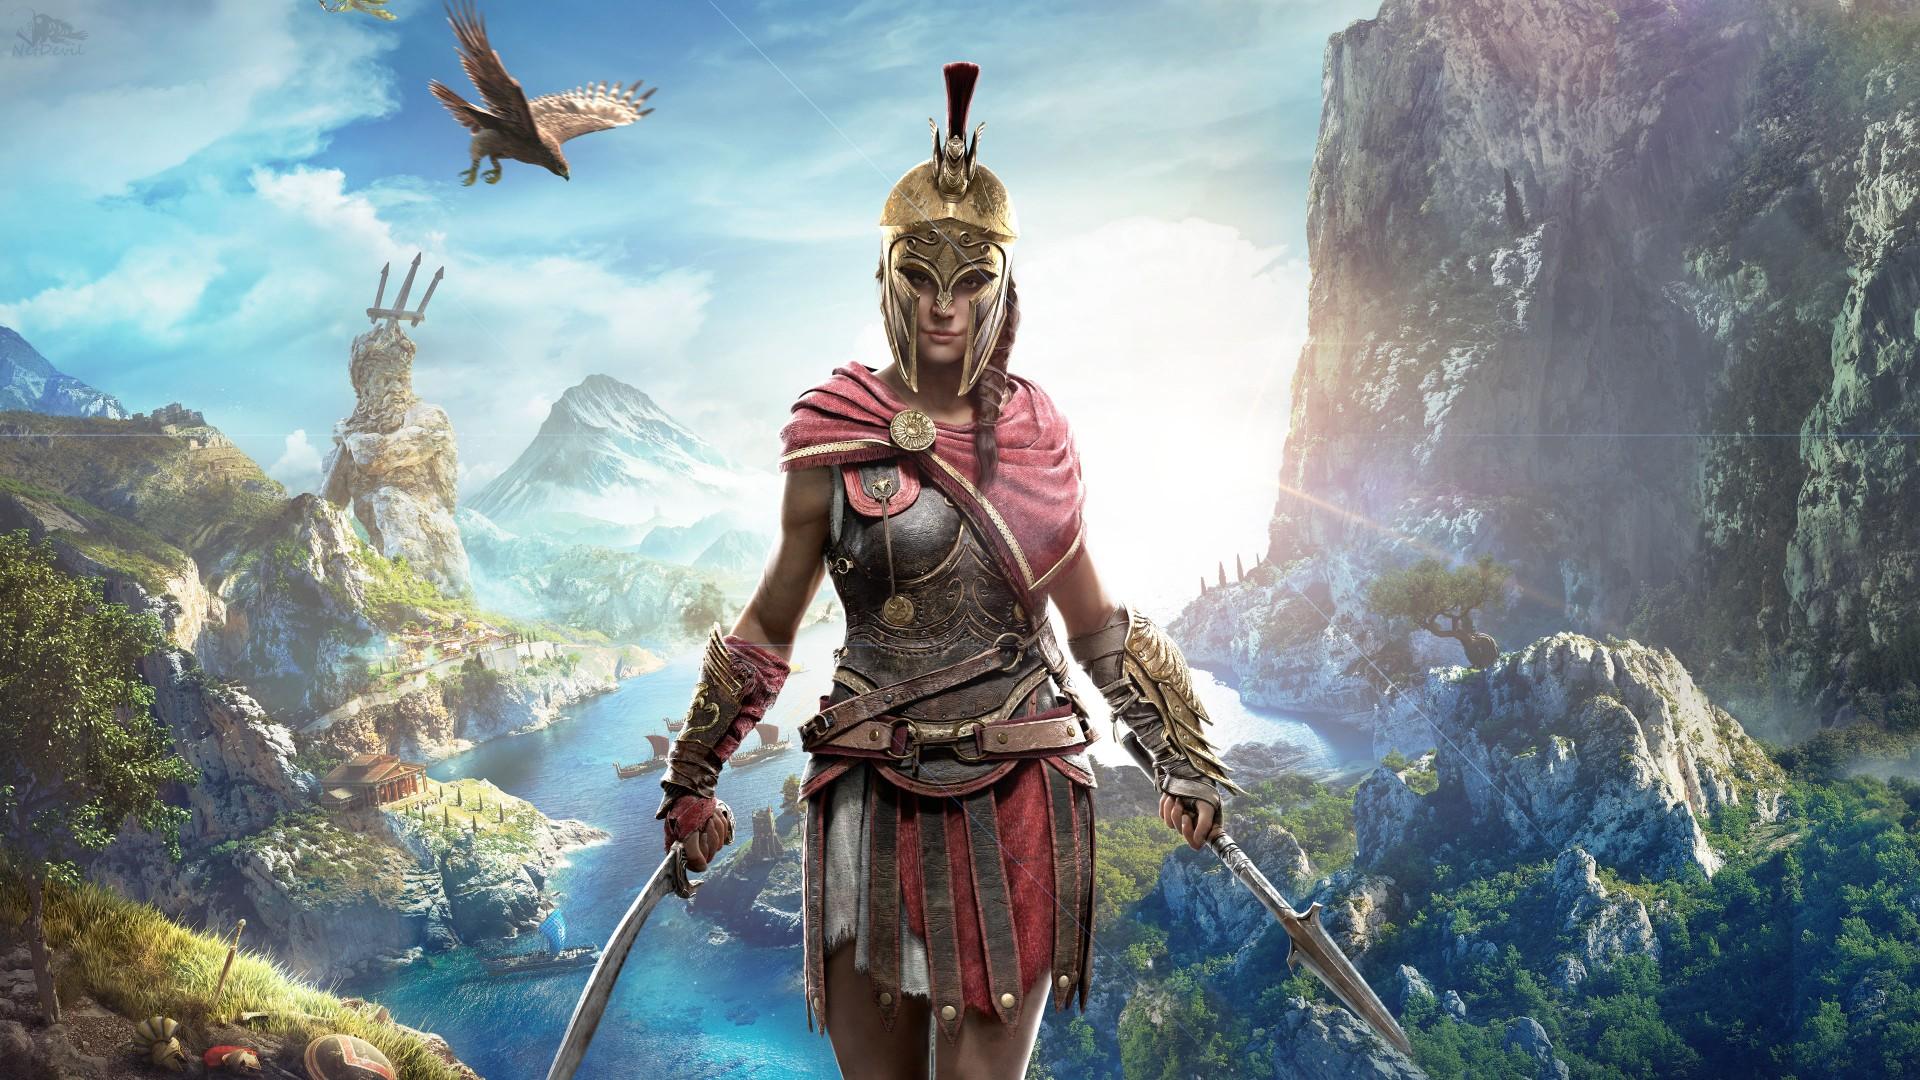 Final Fantasy X Wallpaper Iphone Kassandra In Assassin S Creed Odyssey 4k Wallpapers Hd